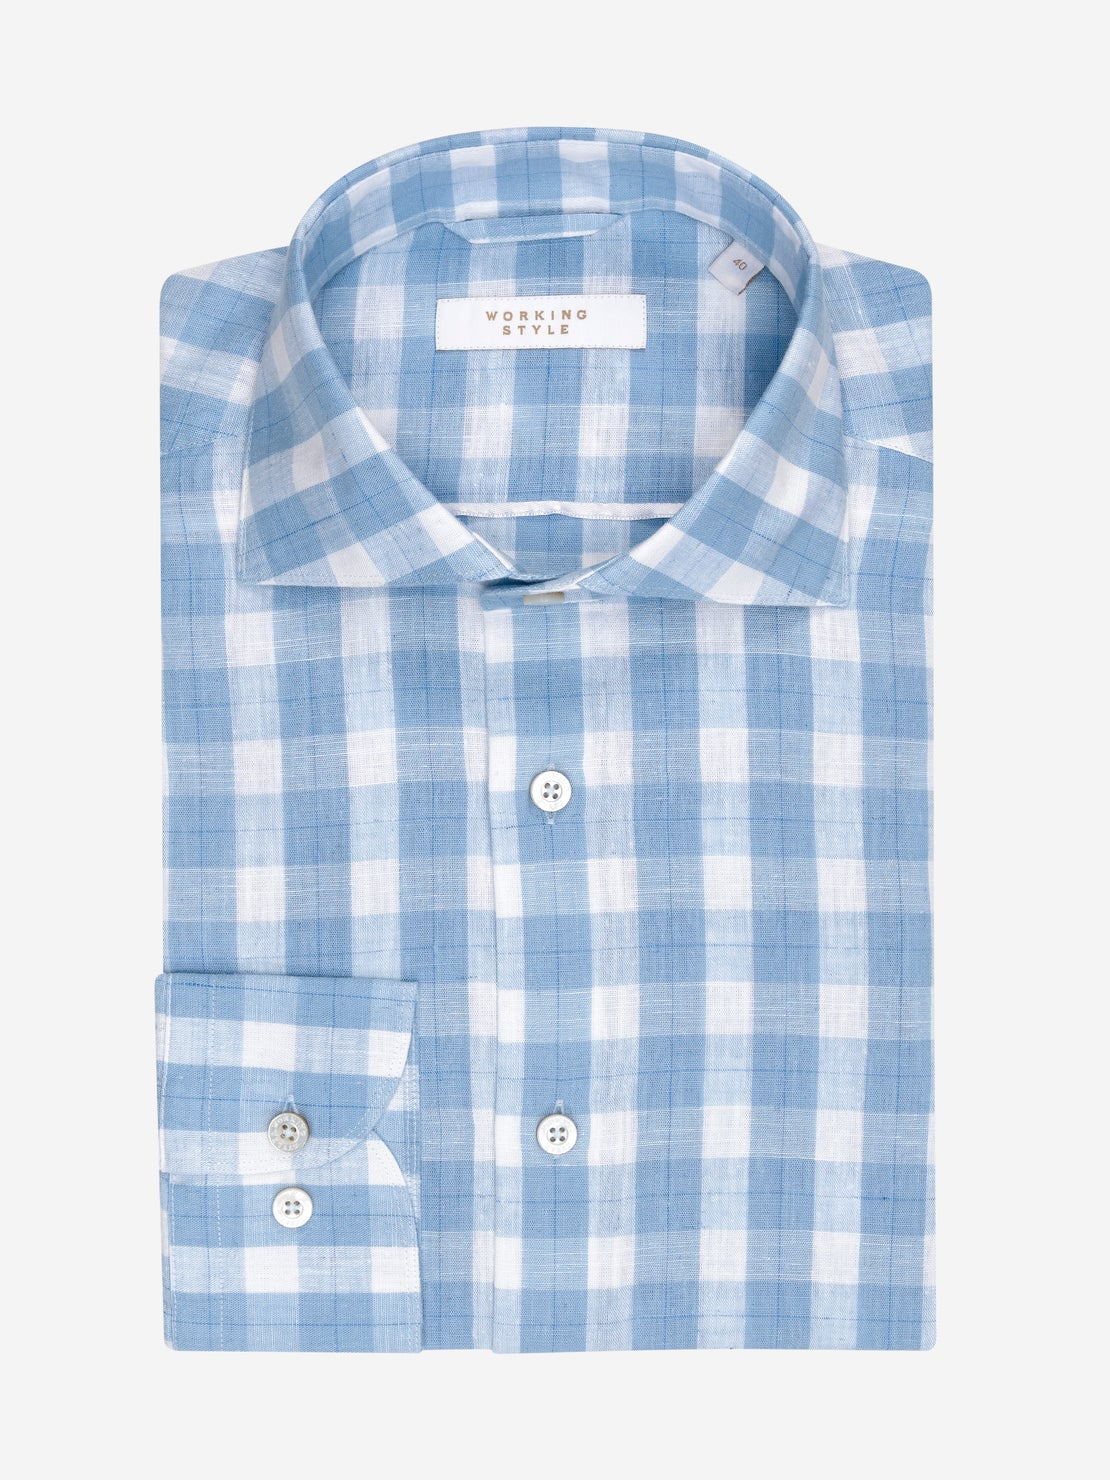 Large Baby Blue Gingham Linen Shirt